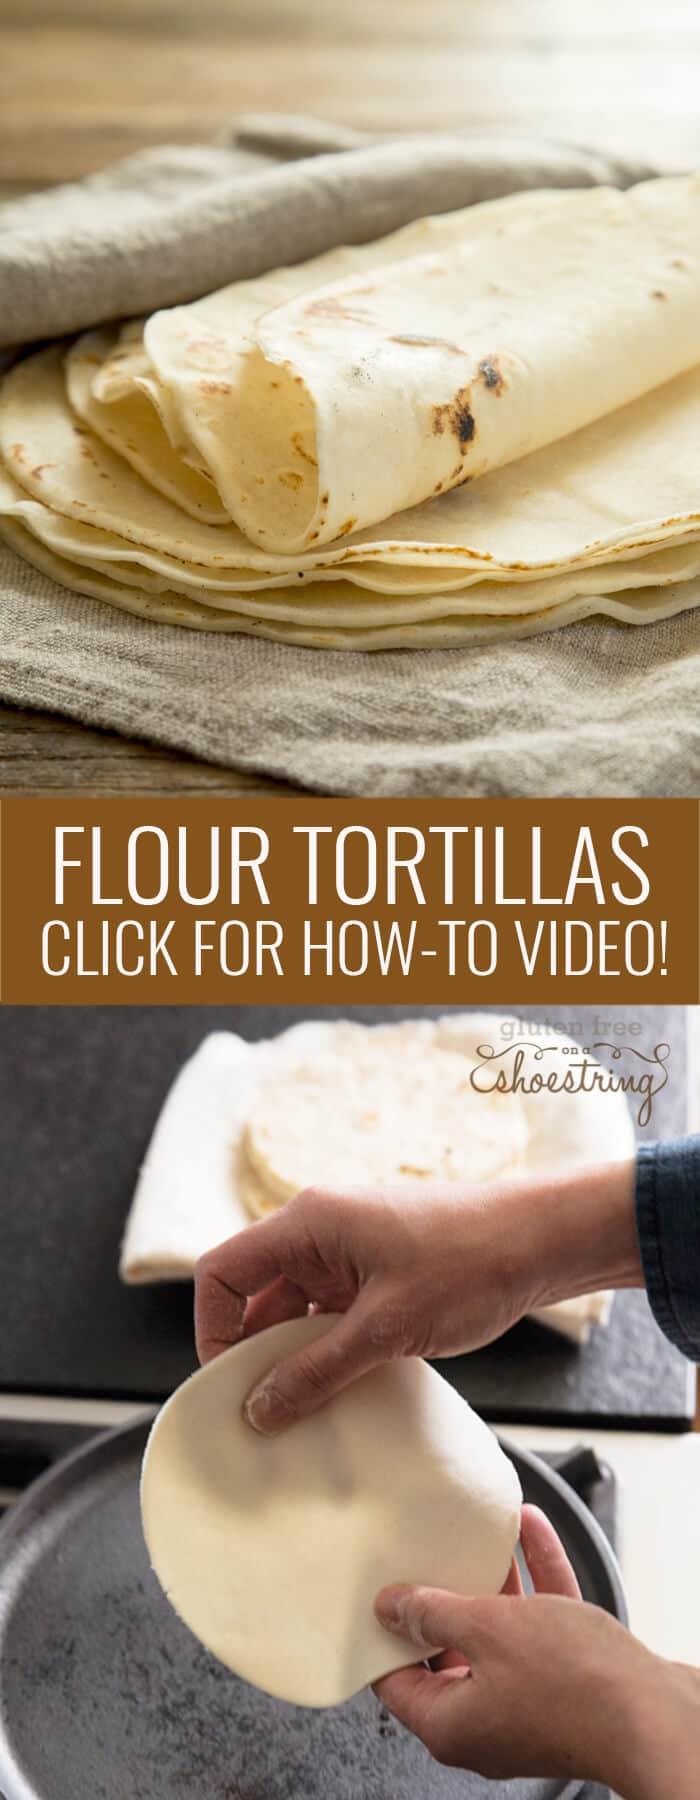 Flour tortillas on gray towel and flour tortillas on white towel